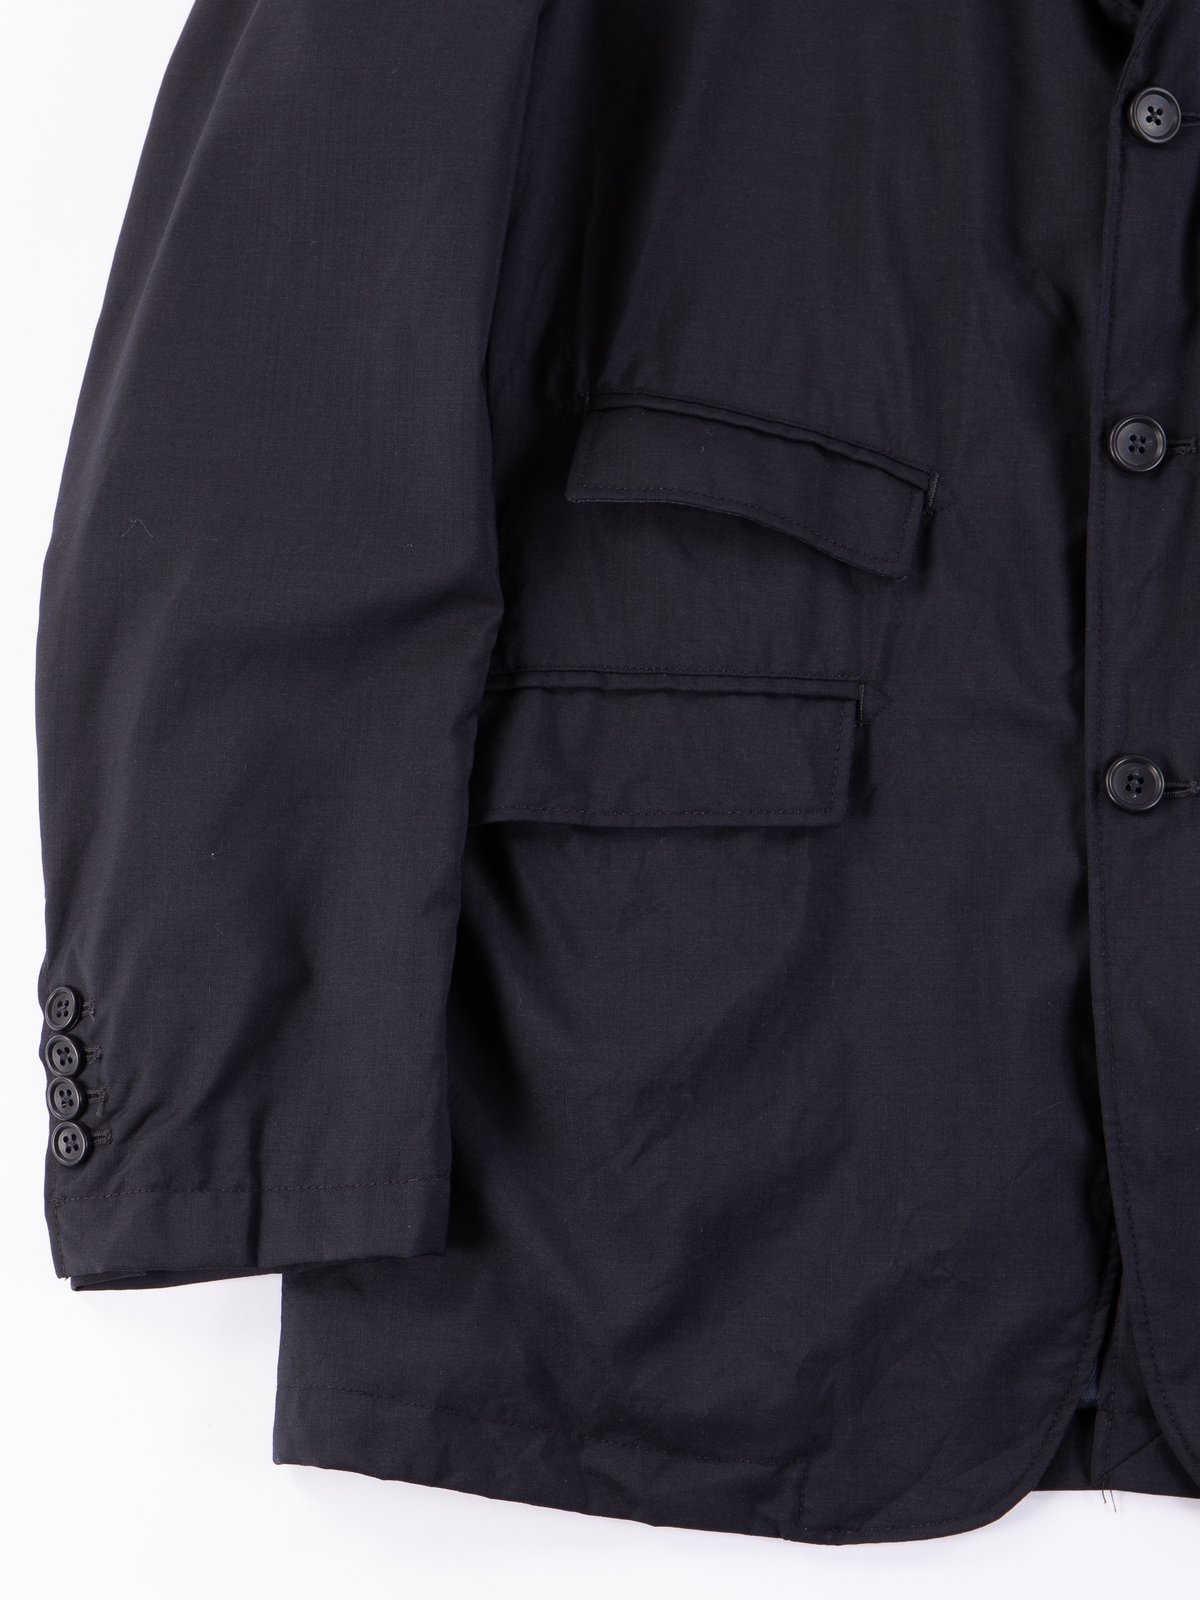 Dark Navy Tropical Wool Andover Jacket - Image 4